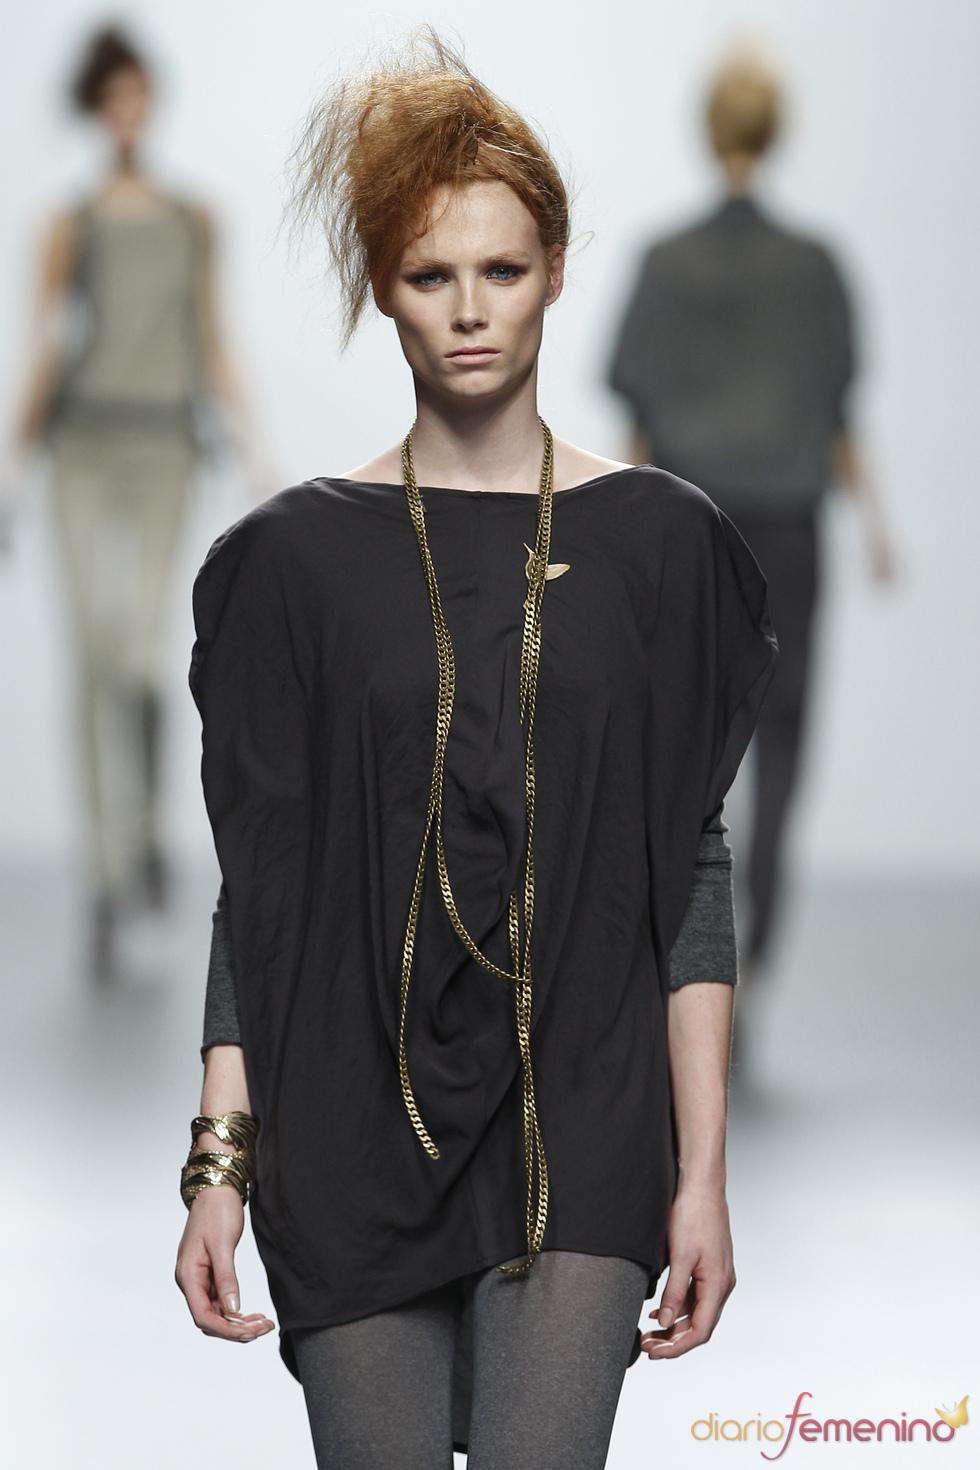 Vestido negro corto. Sara Coleman. Cibeles Madrid Fashion Week 2011